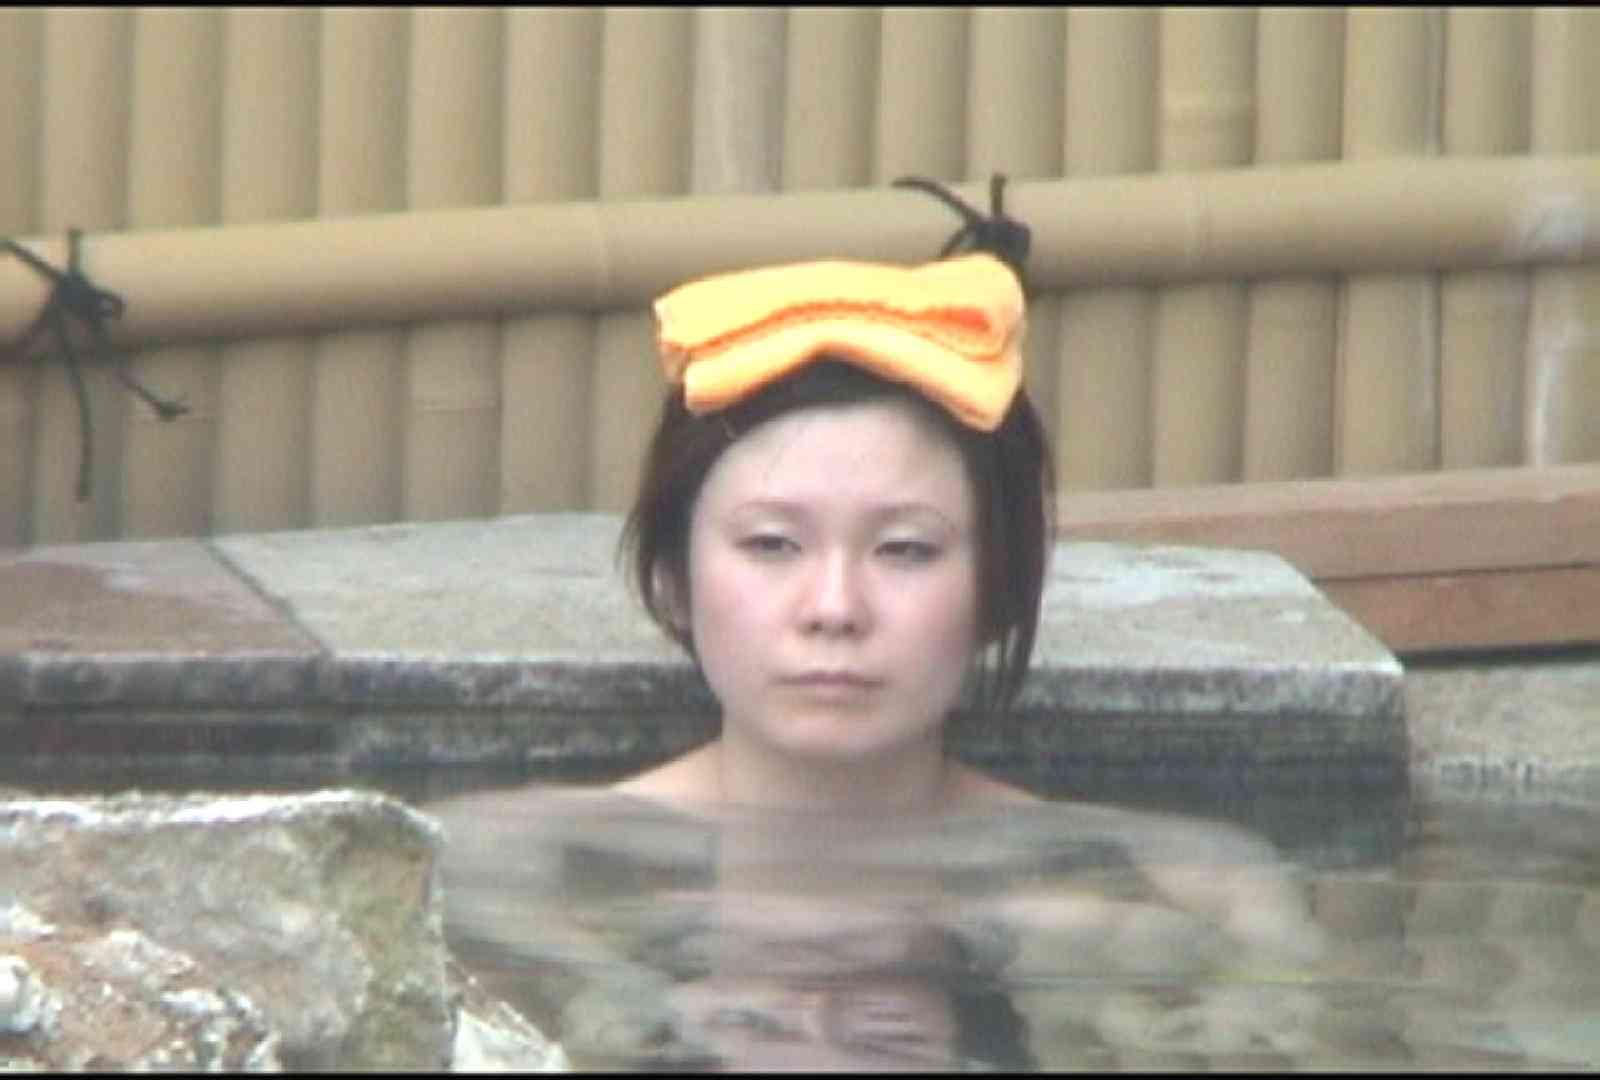 Aquaな露天風呂Vol.177 綺麗なOLたち アダルト動画キャプチャ 112枚 83